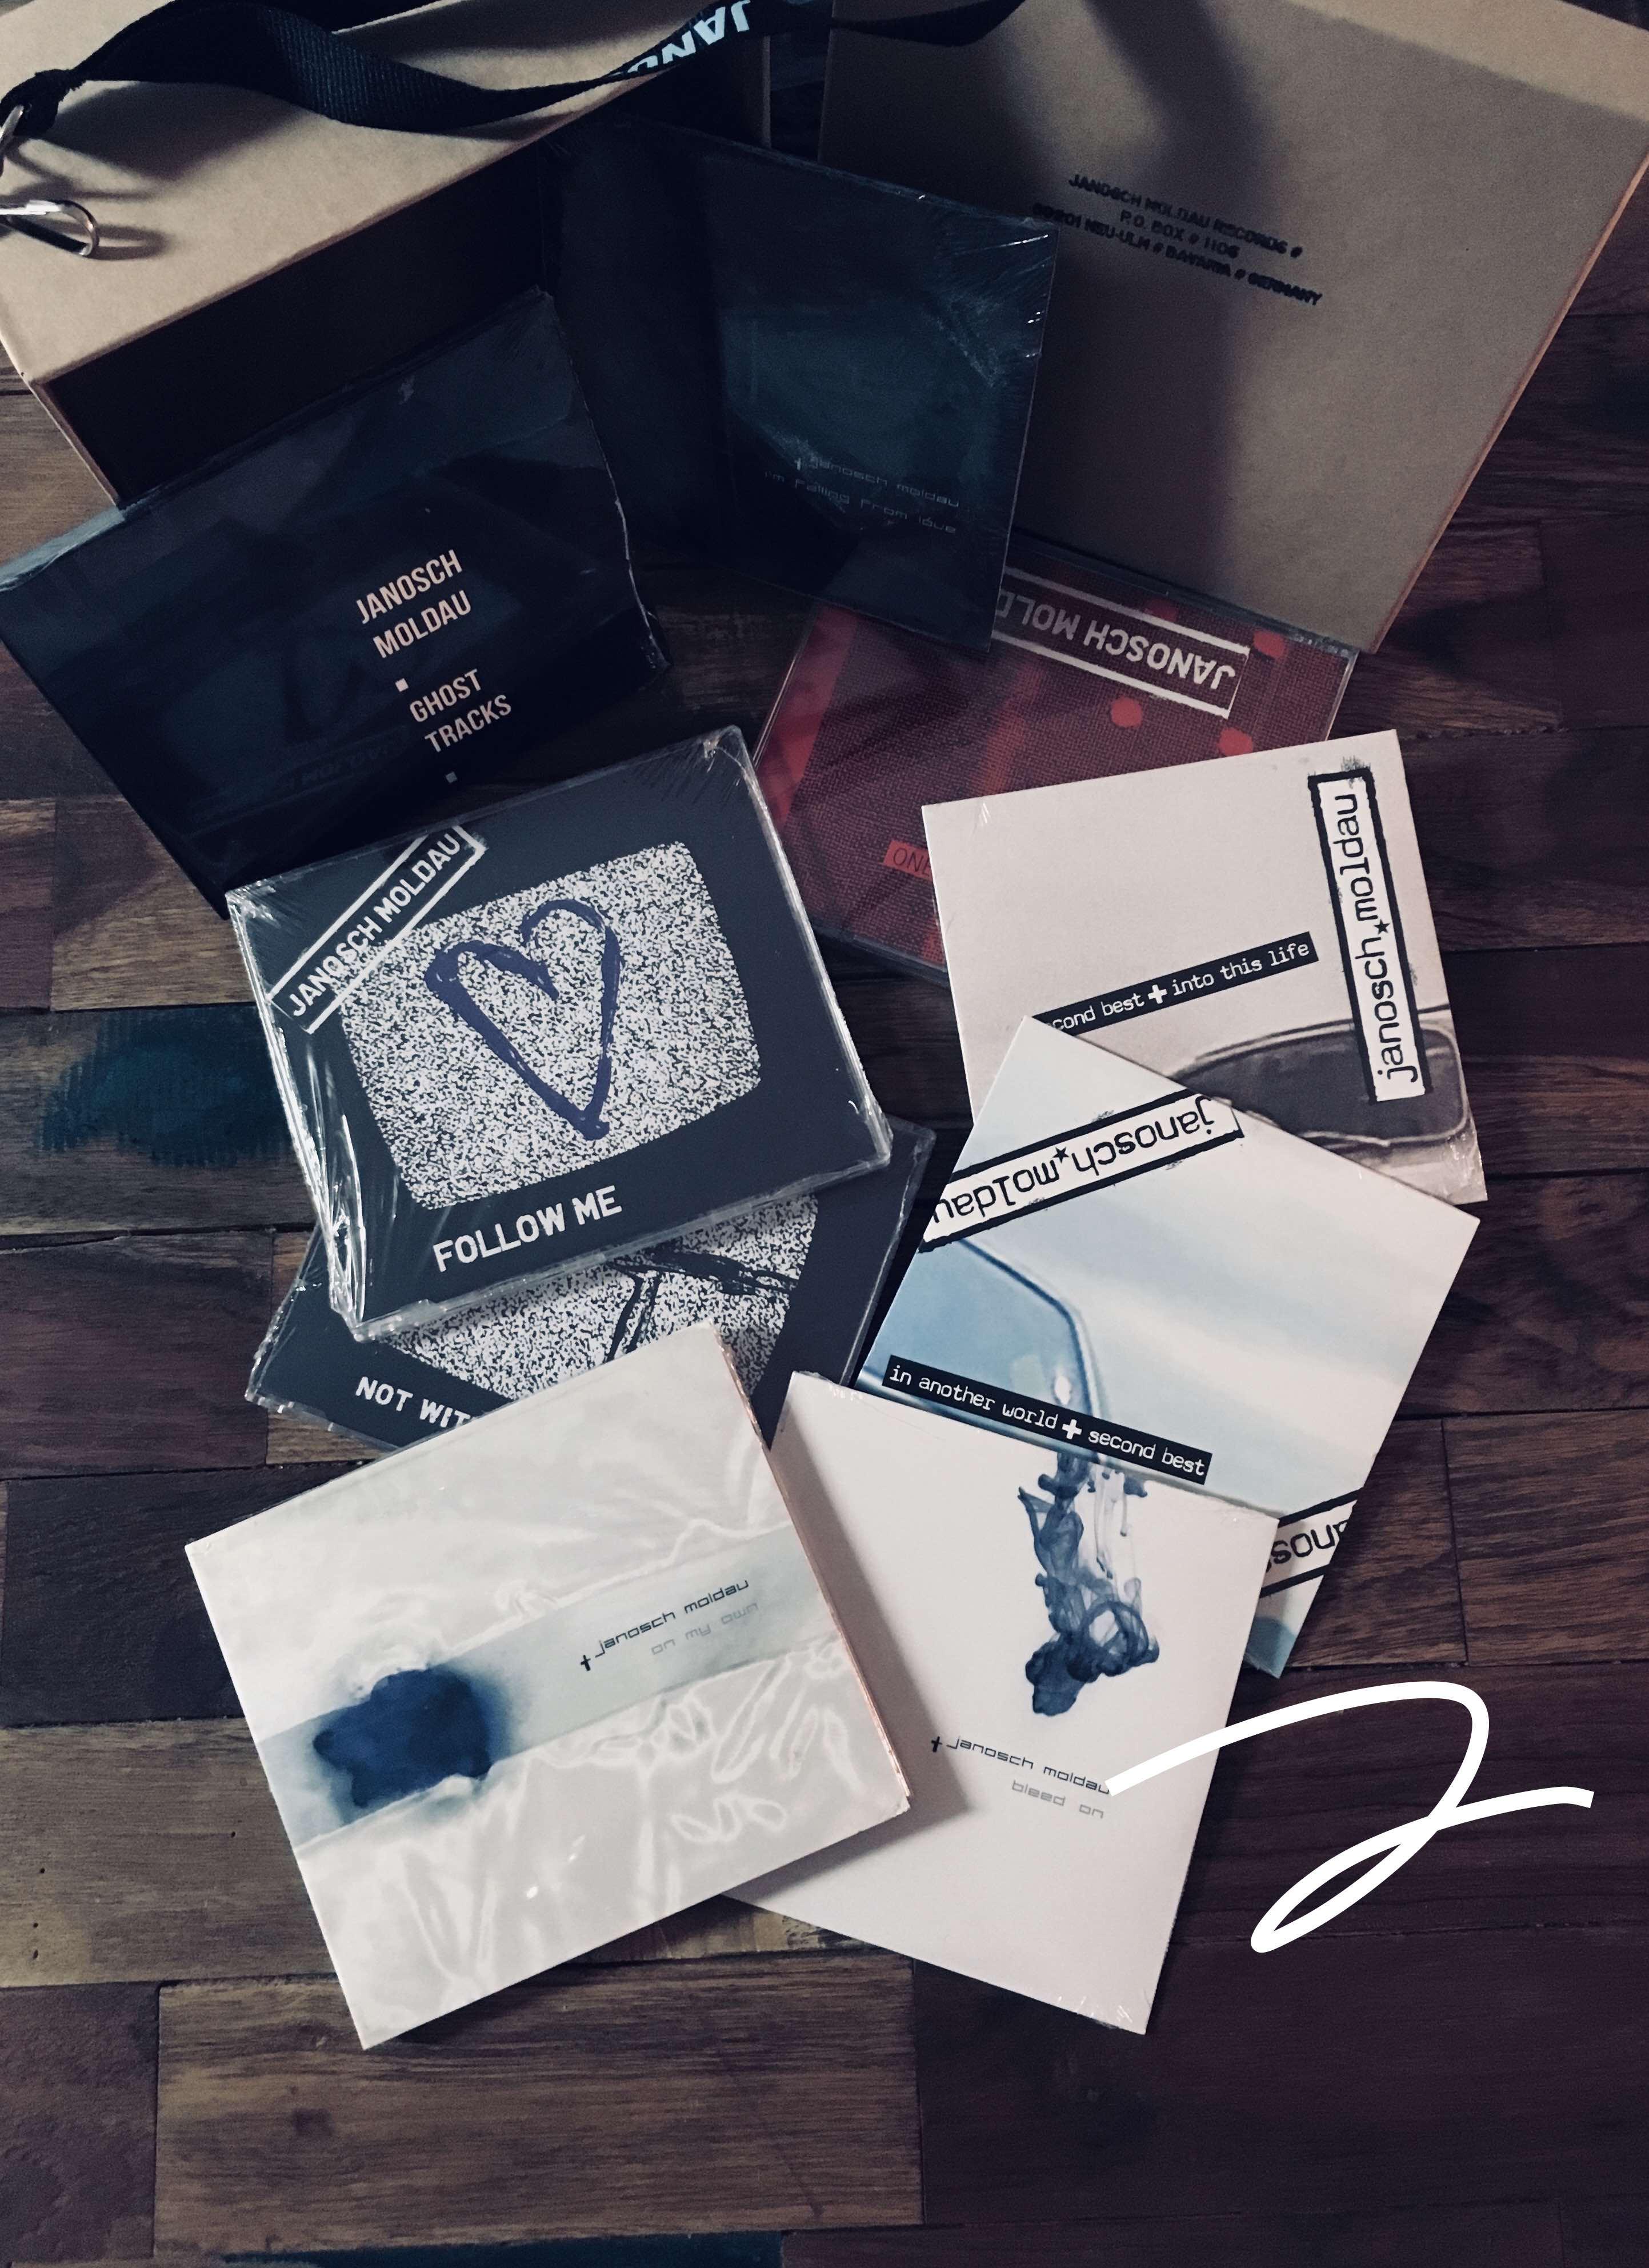 jm complete singles+remixes